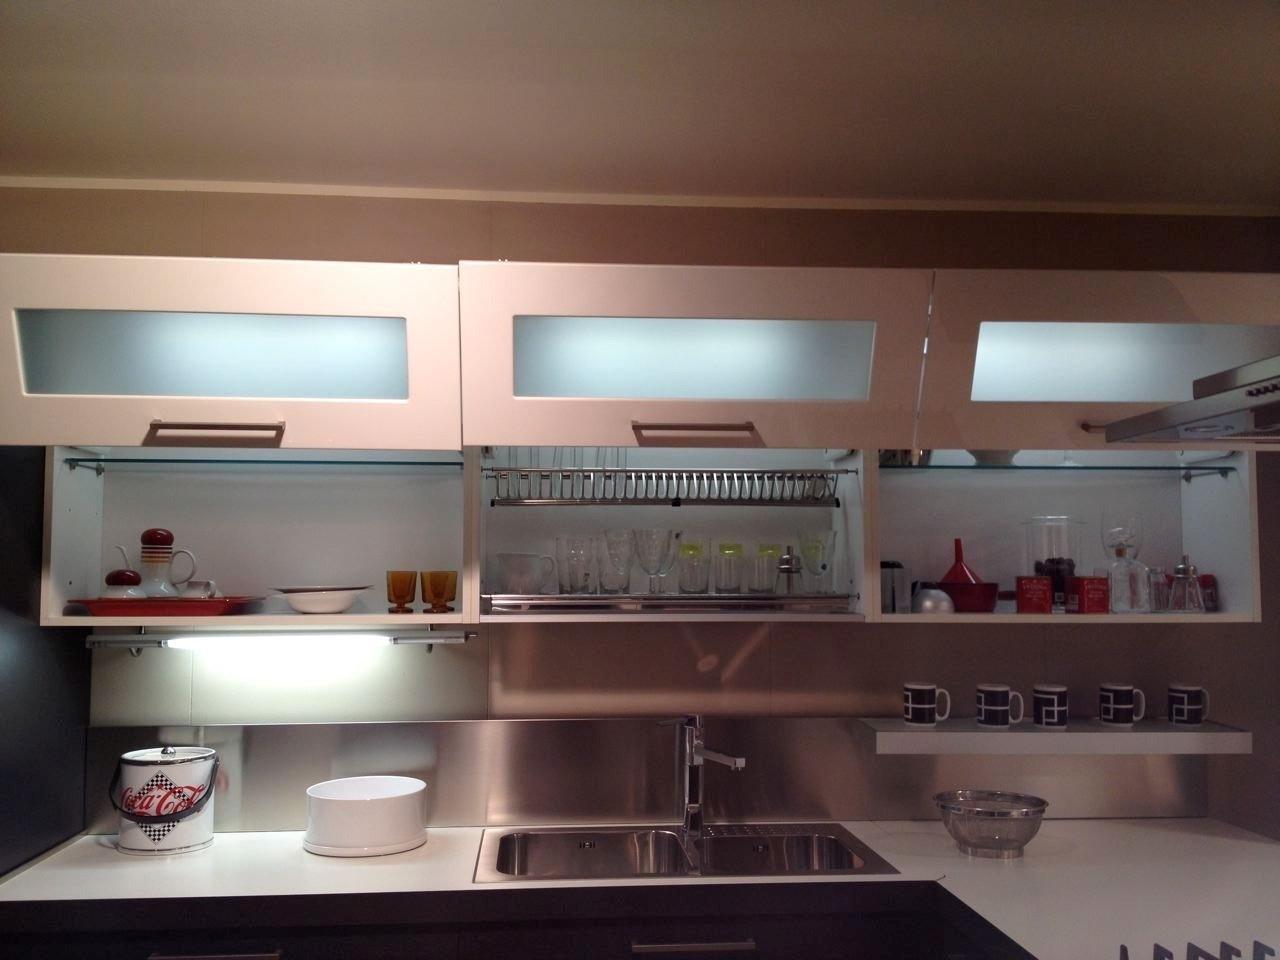 Programma per comporre cucine best camerette programma per disegnare cucine programmi per - Programma per progettare cucine ...